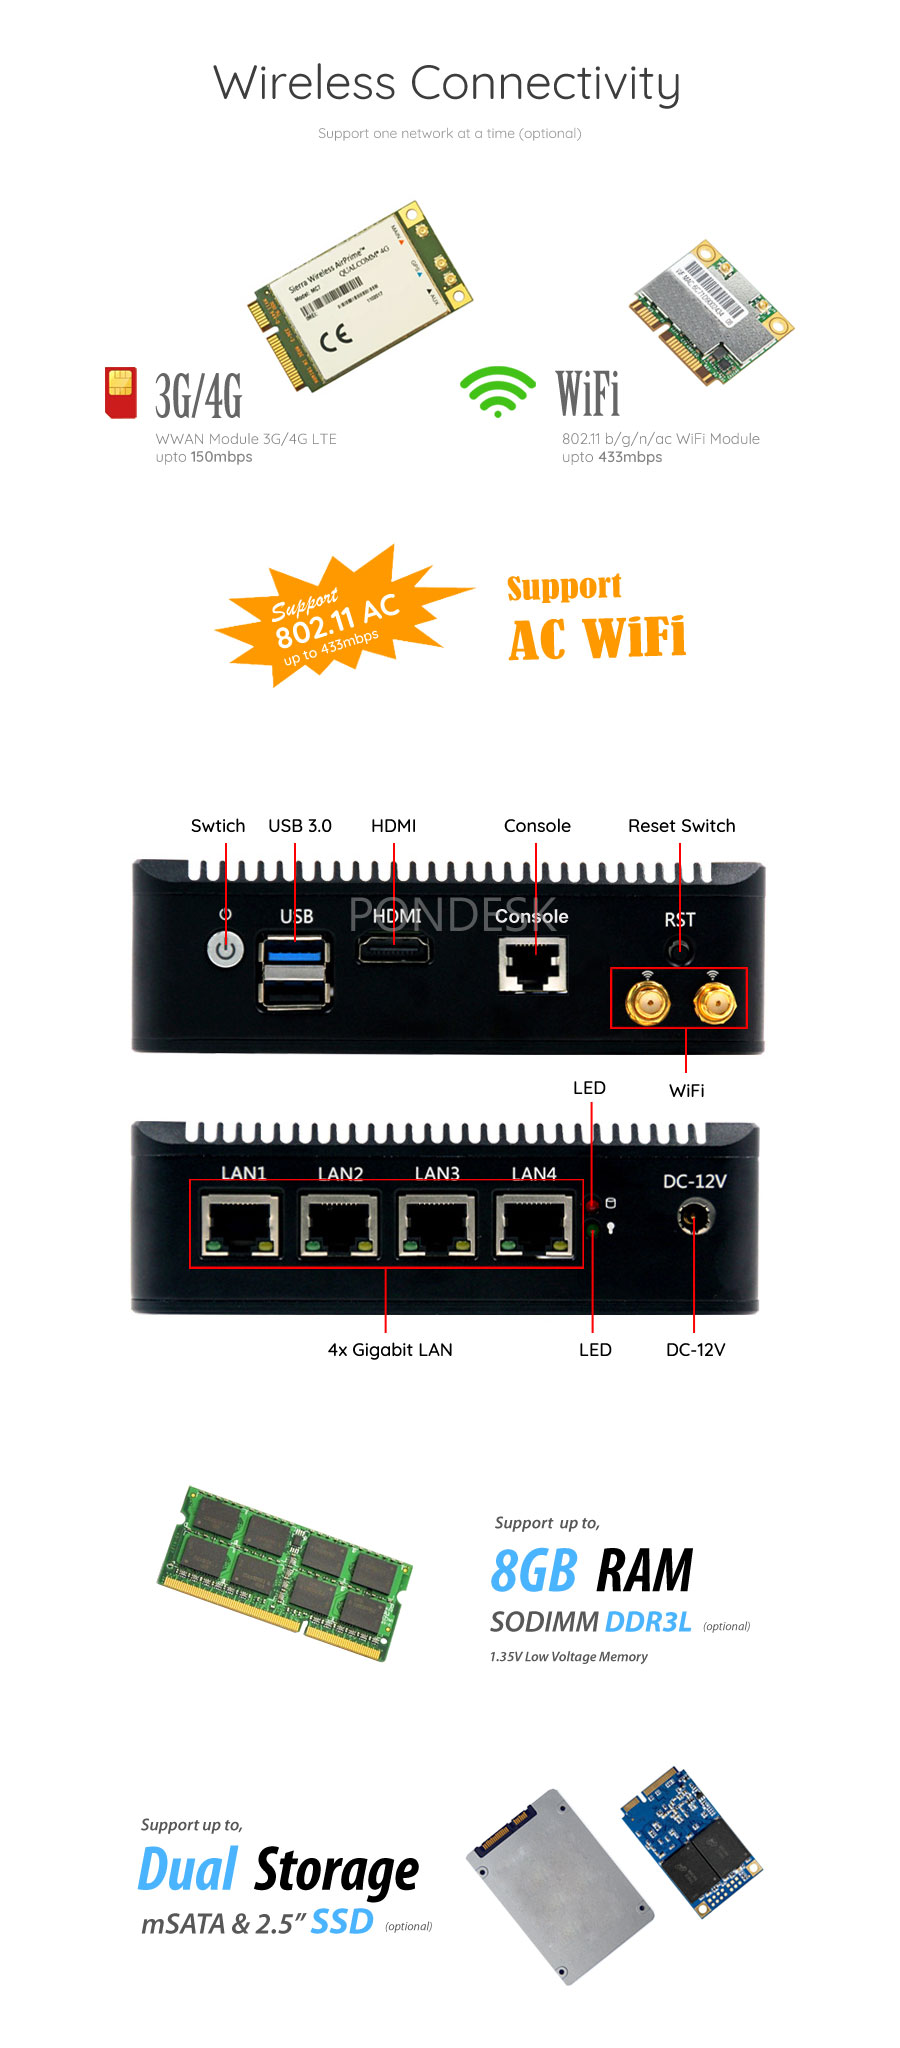 Intel® E3845 4 LAN 1 COM AES-NI 4G Fanless Firewall Router - MNHO-073 | Image